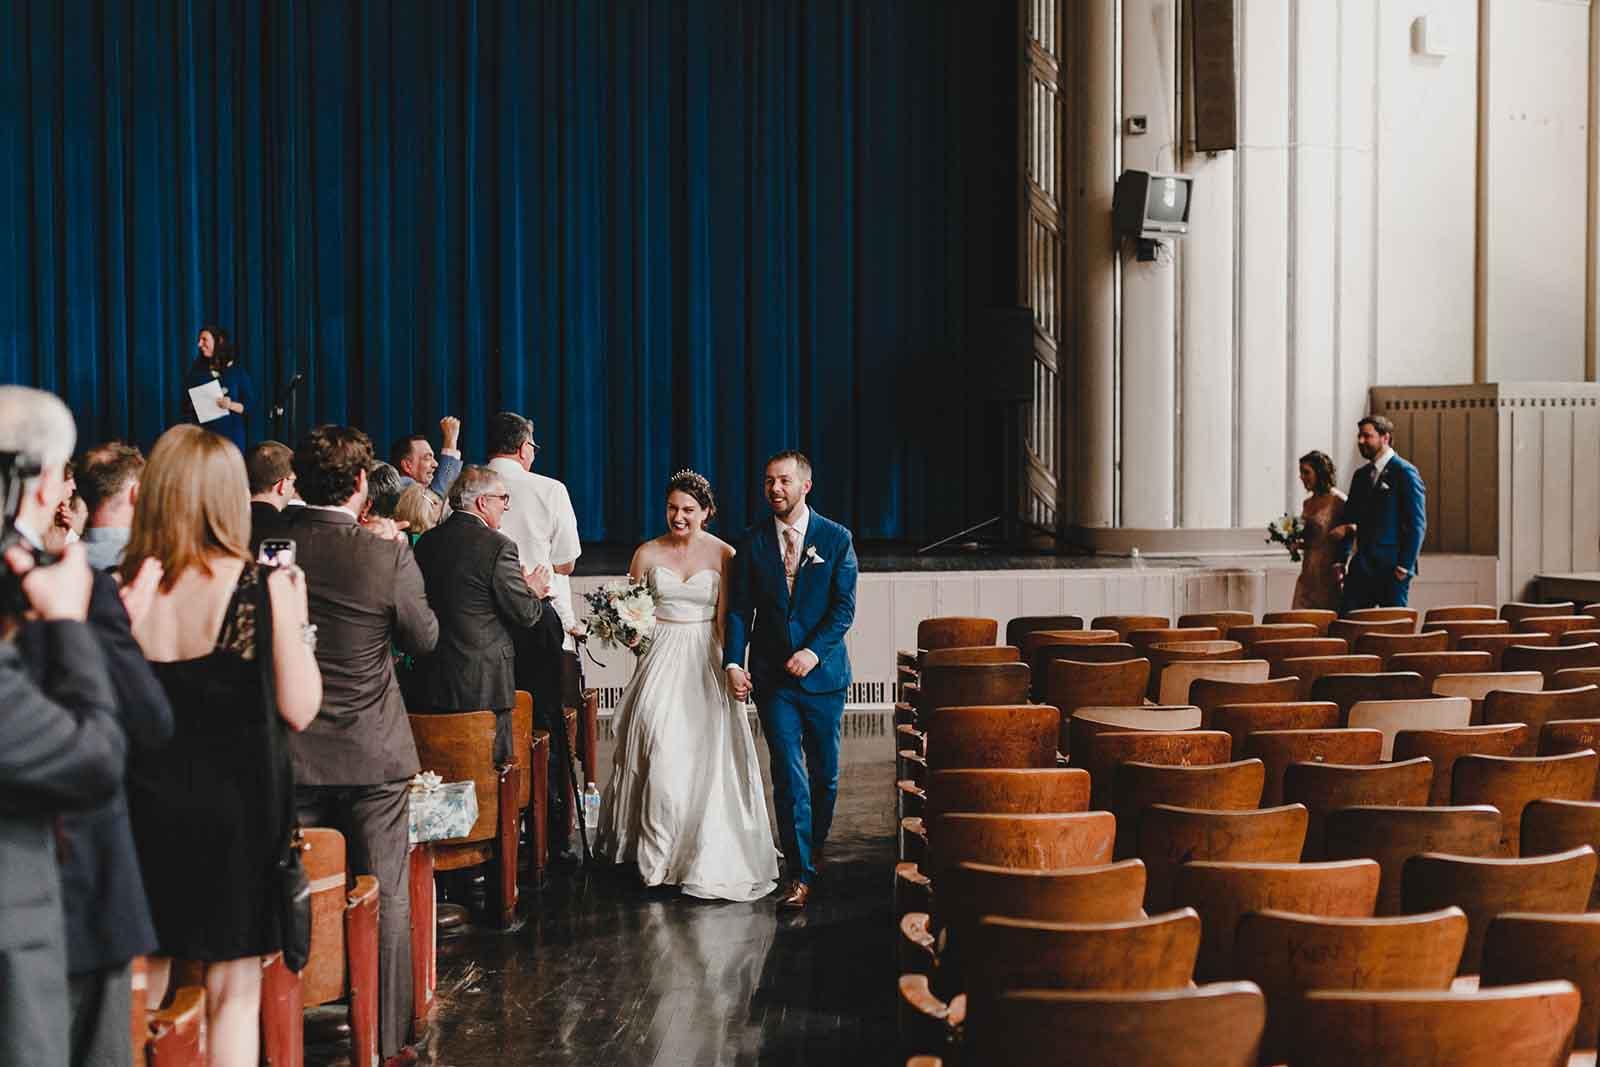 bok-wedding-philadelphia-sarah-rich-14.jpg